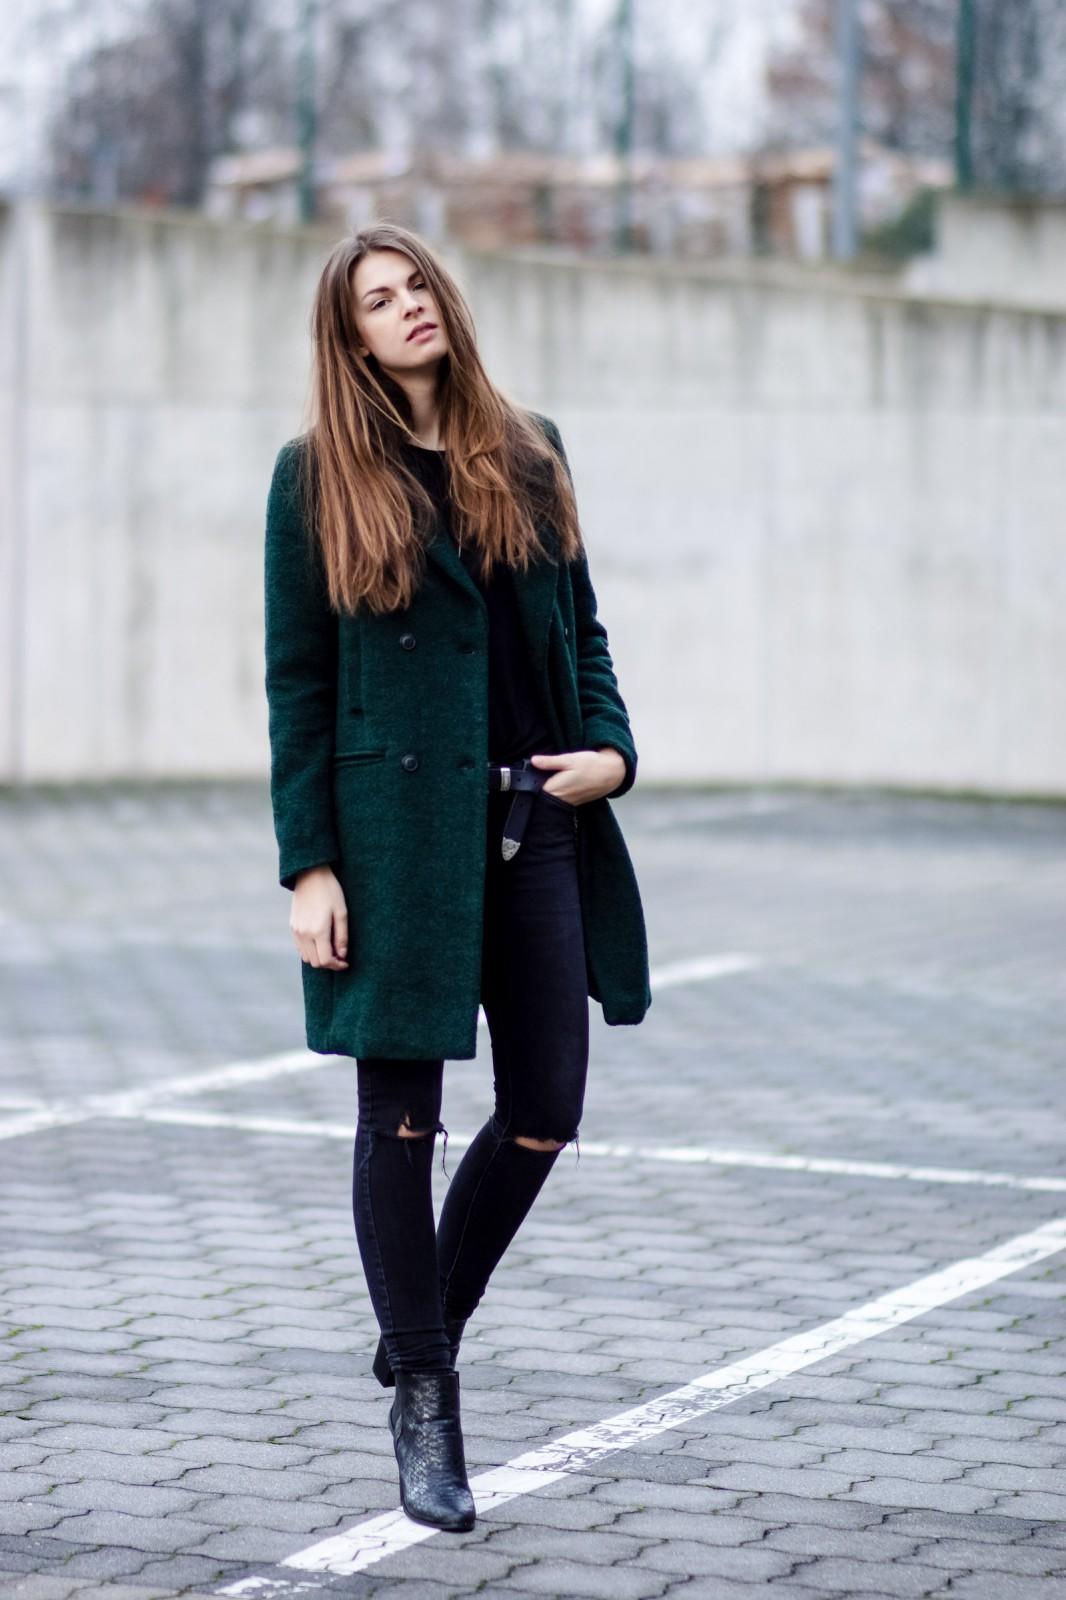 green coat fashionblog berlin ... gdxietl